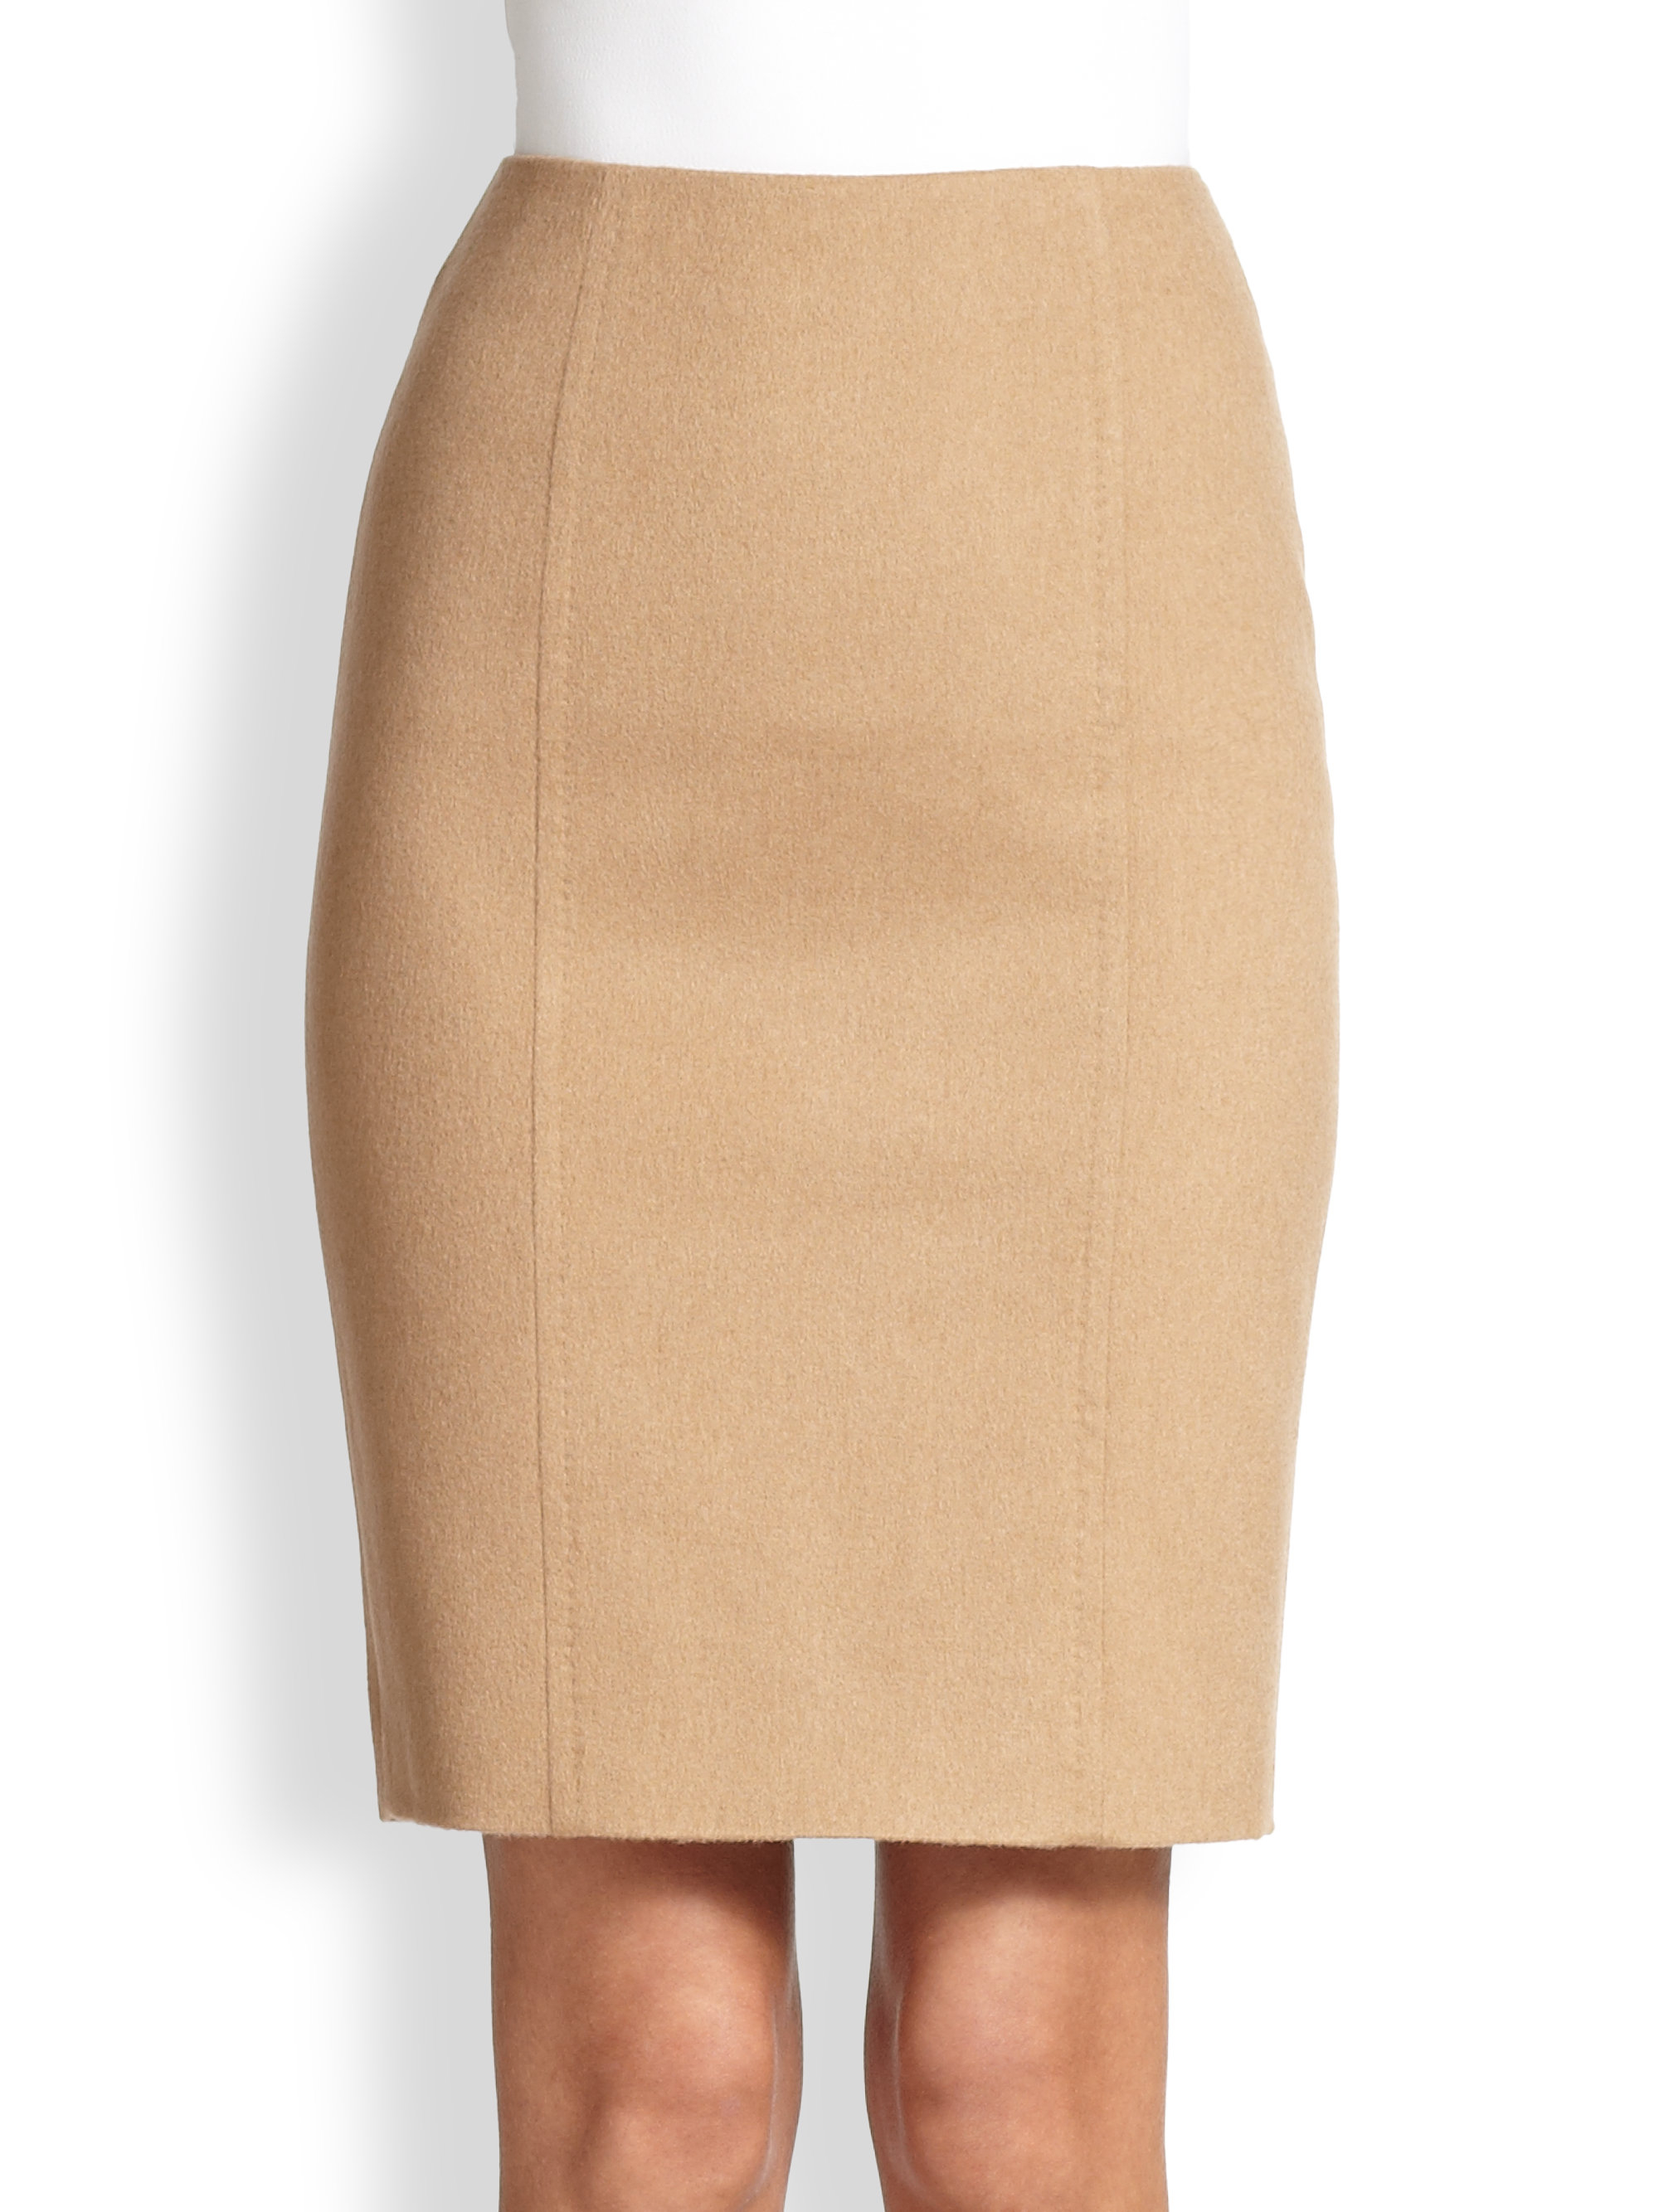 Max mara Sargano Camel Hair Pencil Skirt in Brown | Lyst